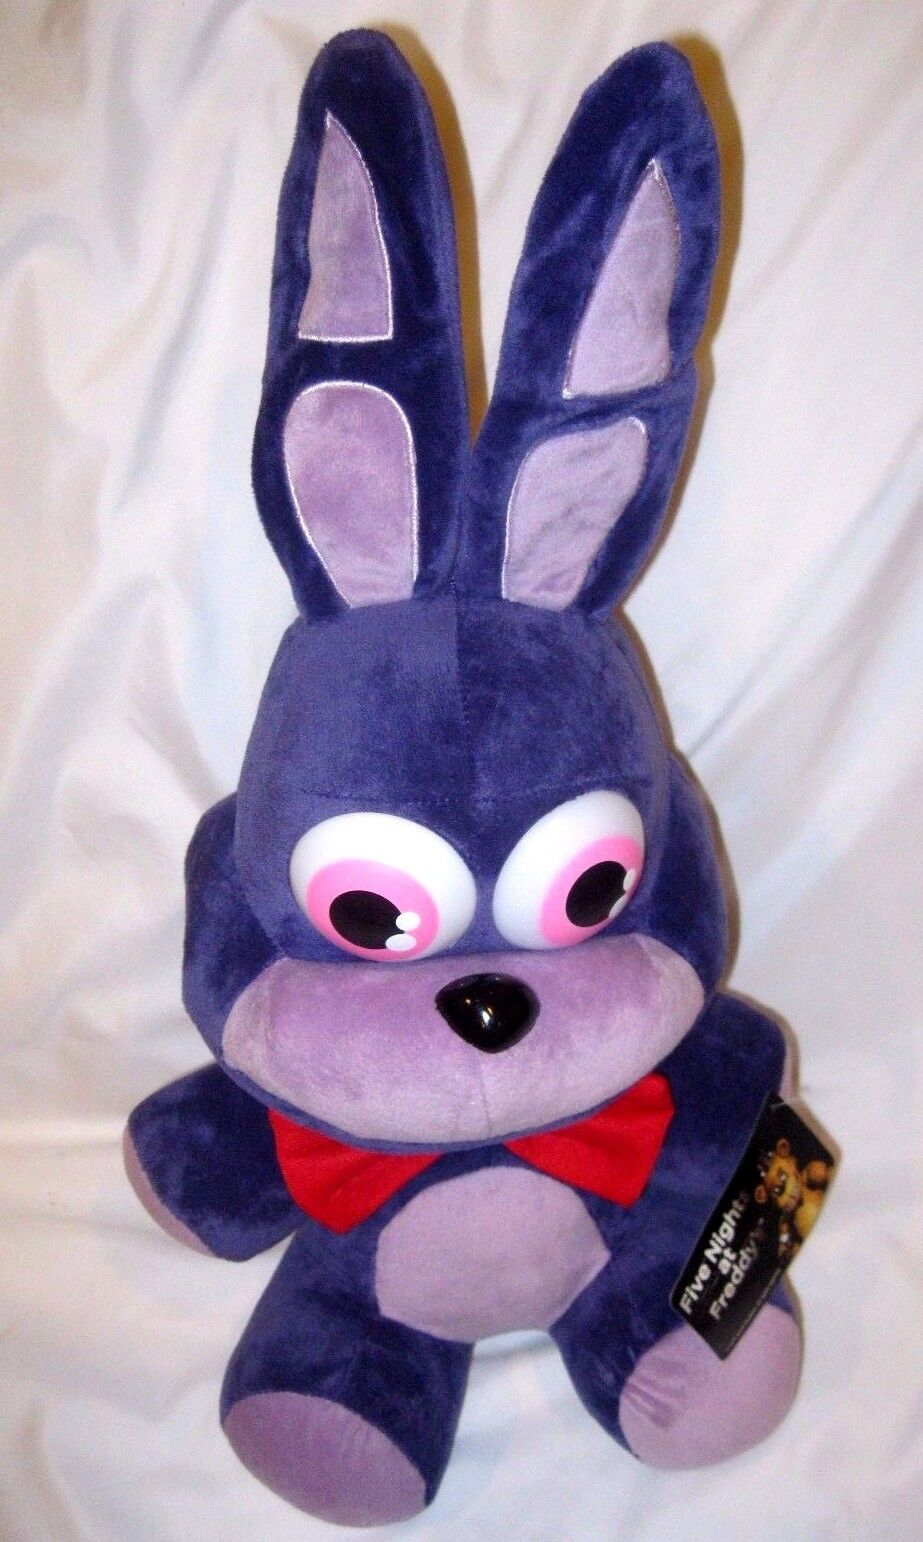 Five Nights at Frossody's 15  Bonnie viola Rabbit Plush-FNF 15  Bonnie Plush-Nuovo